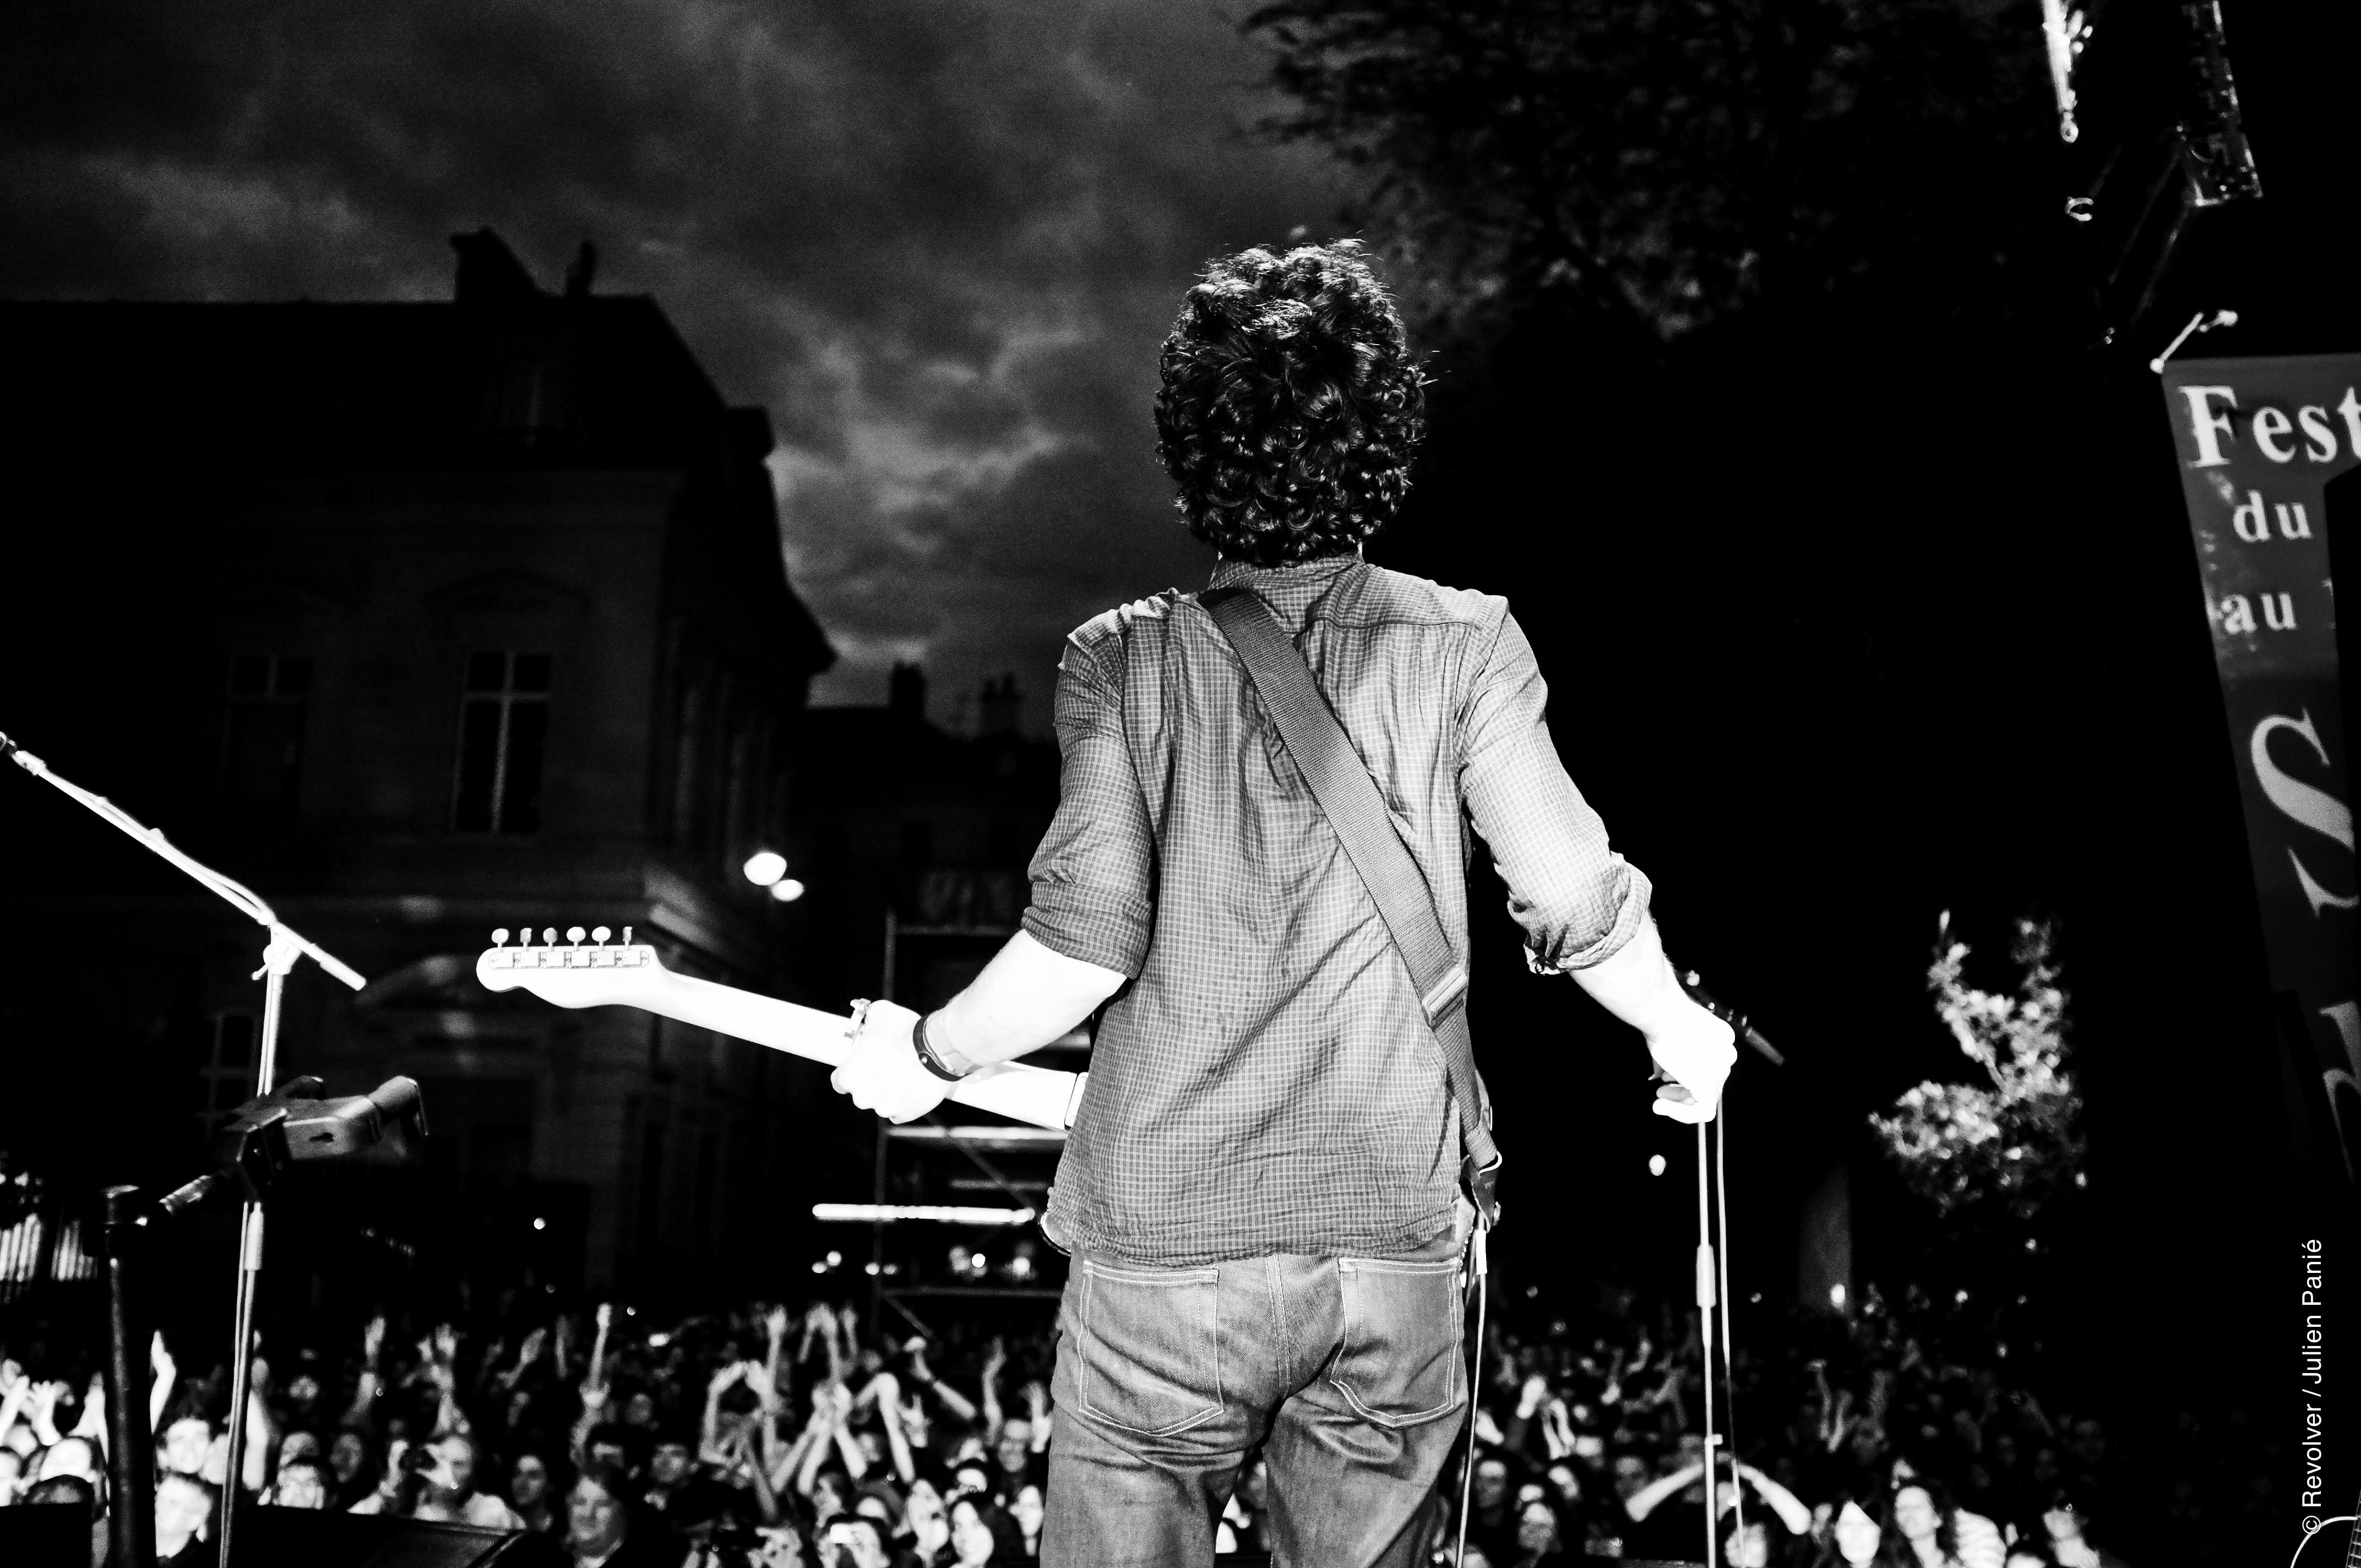 Revolver_Paris-10.jpg